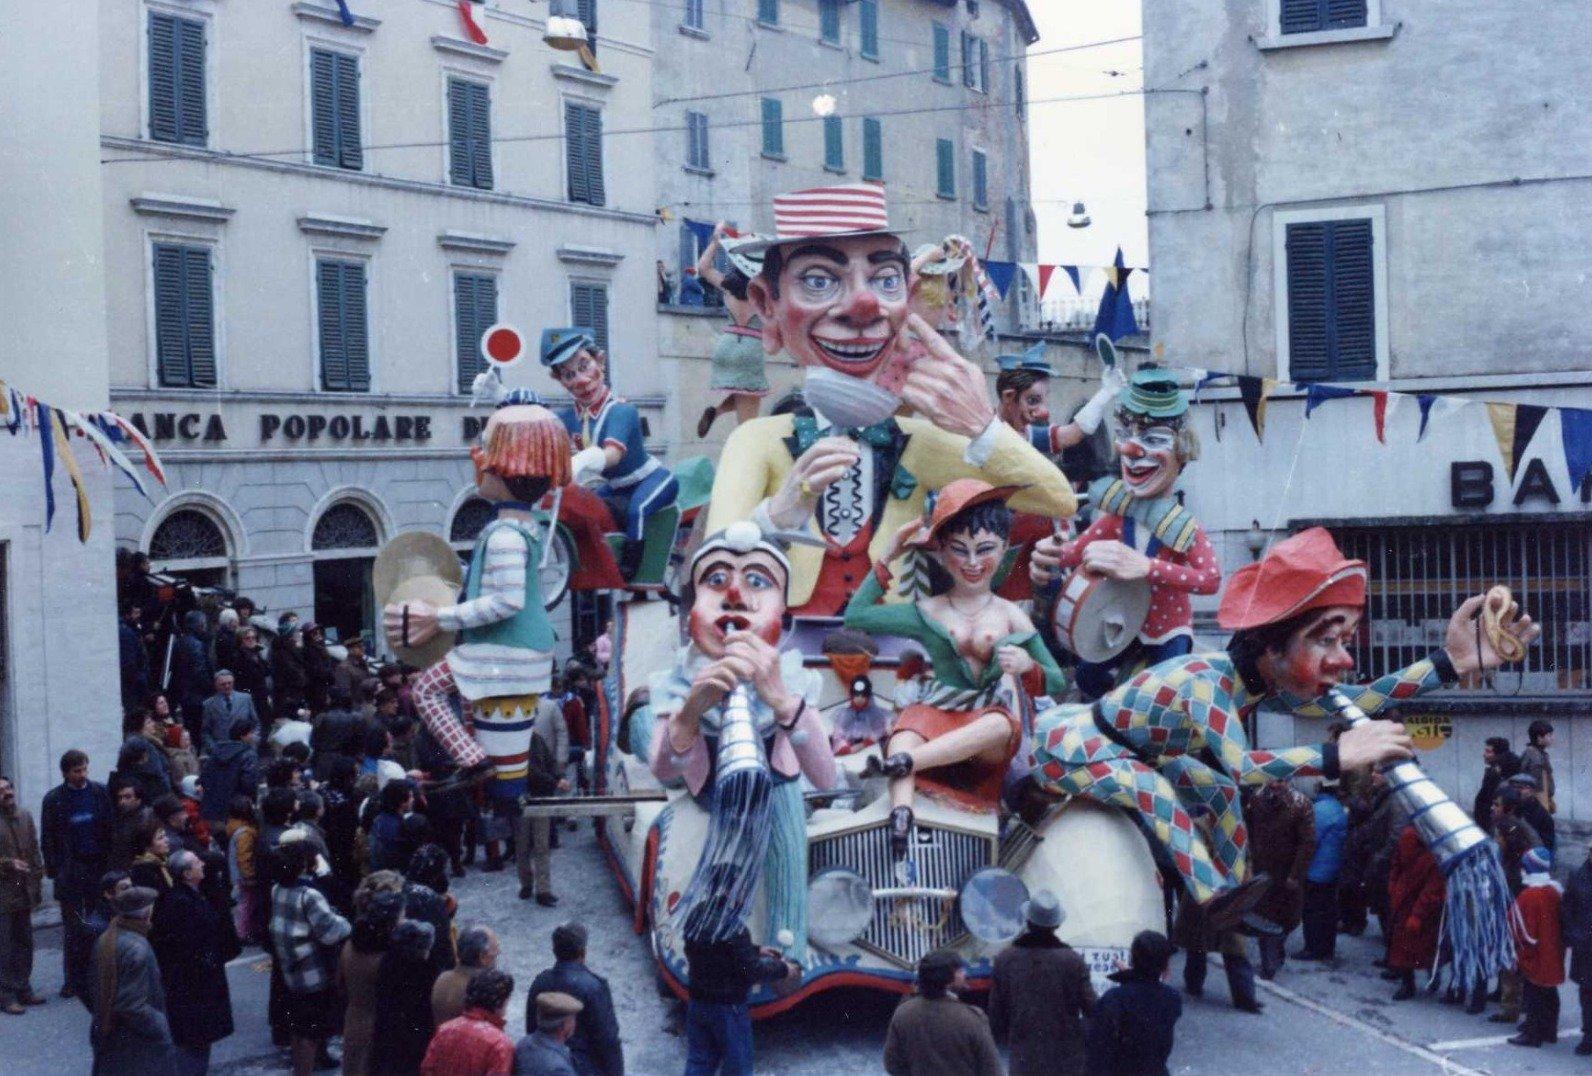 Sbornia di carnevale-1985